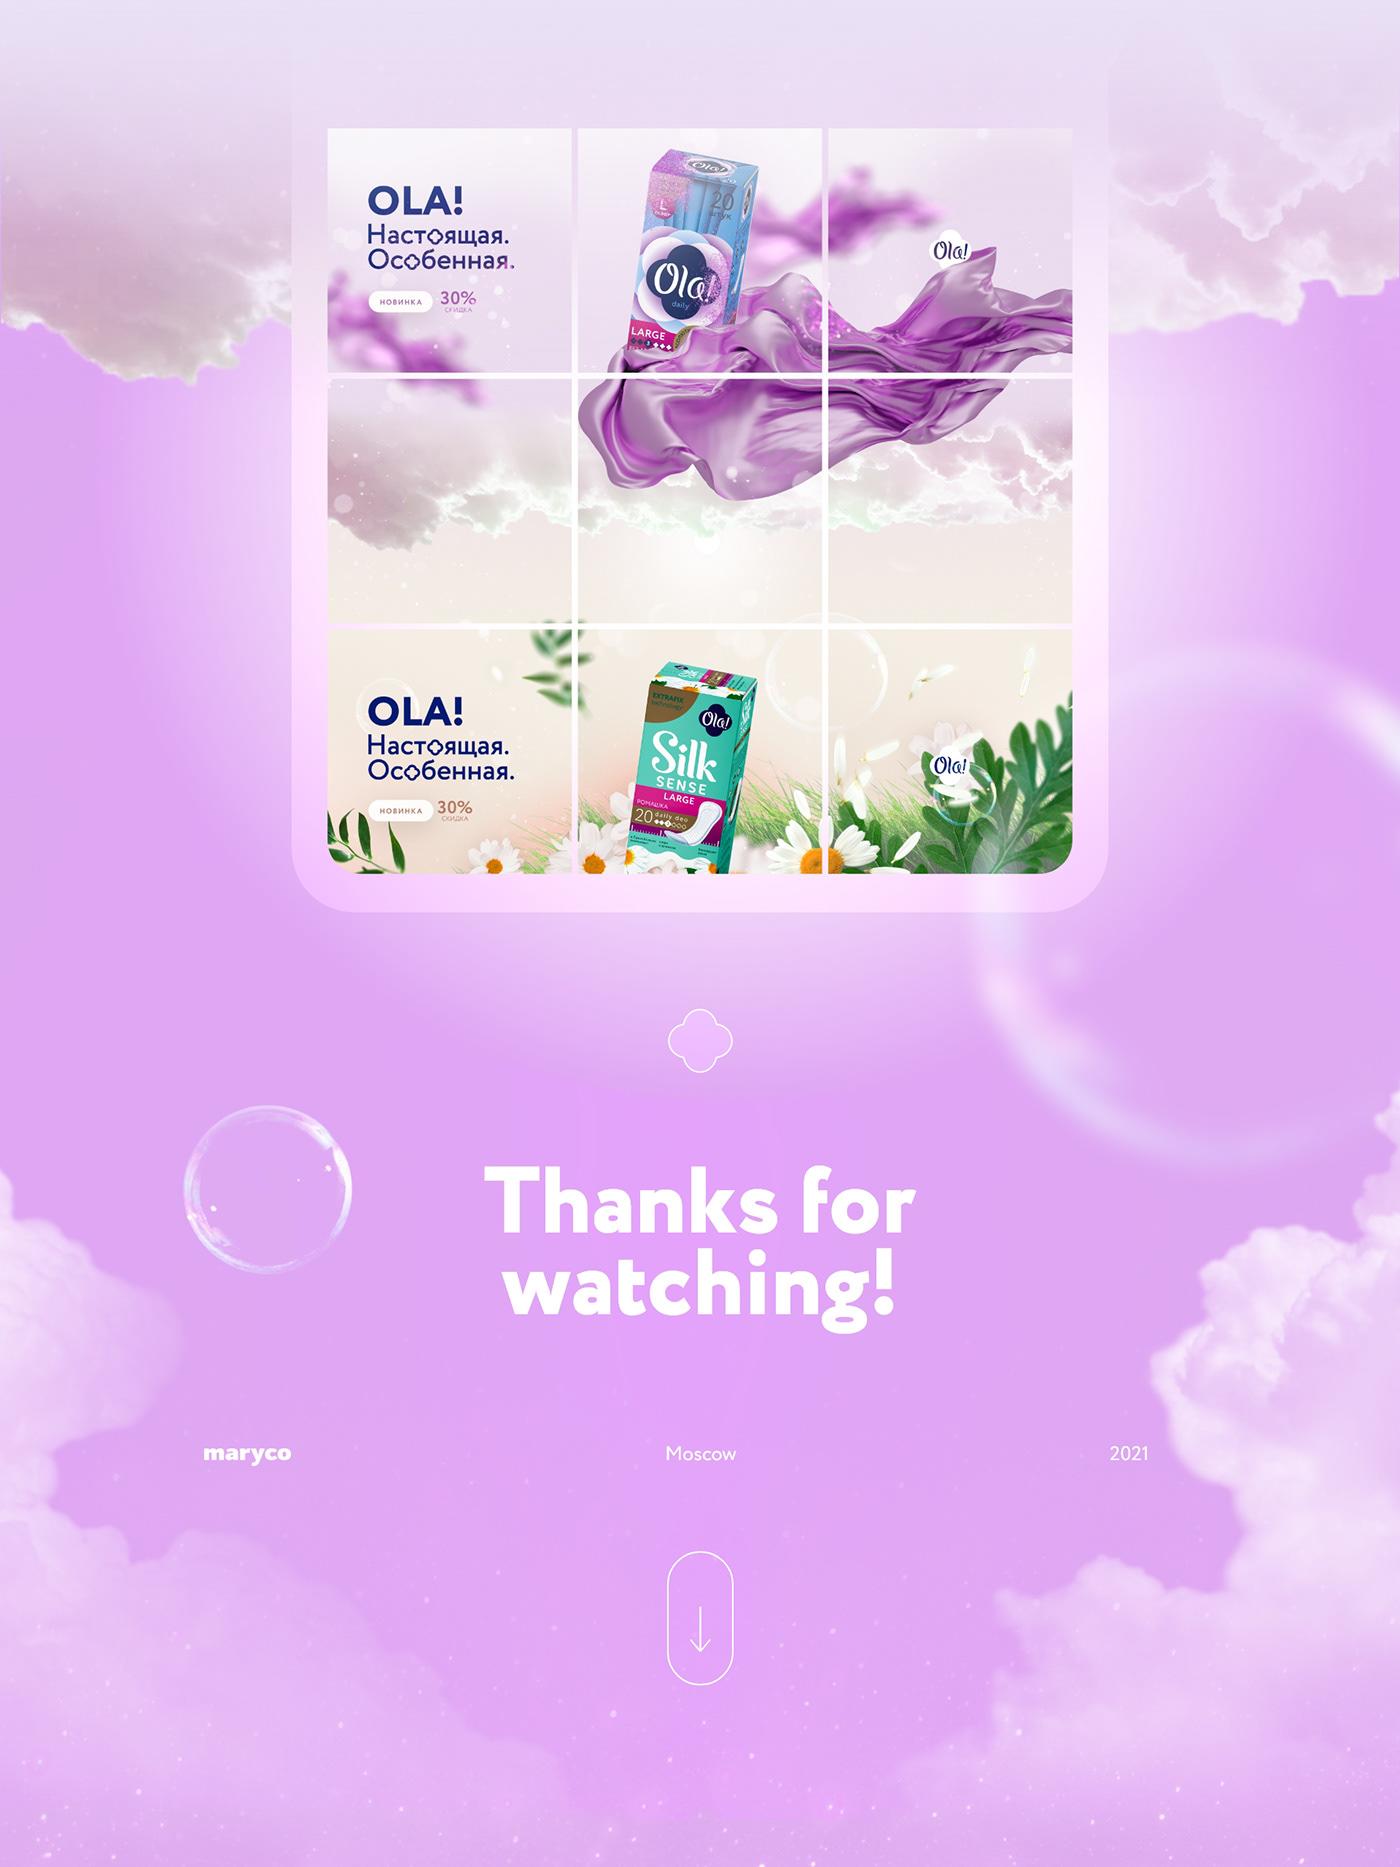 ad banners design concept pink social media Target ad turquoise Дизайн-концепция реклама таргетированная реклама